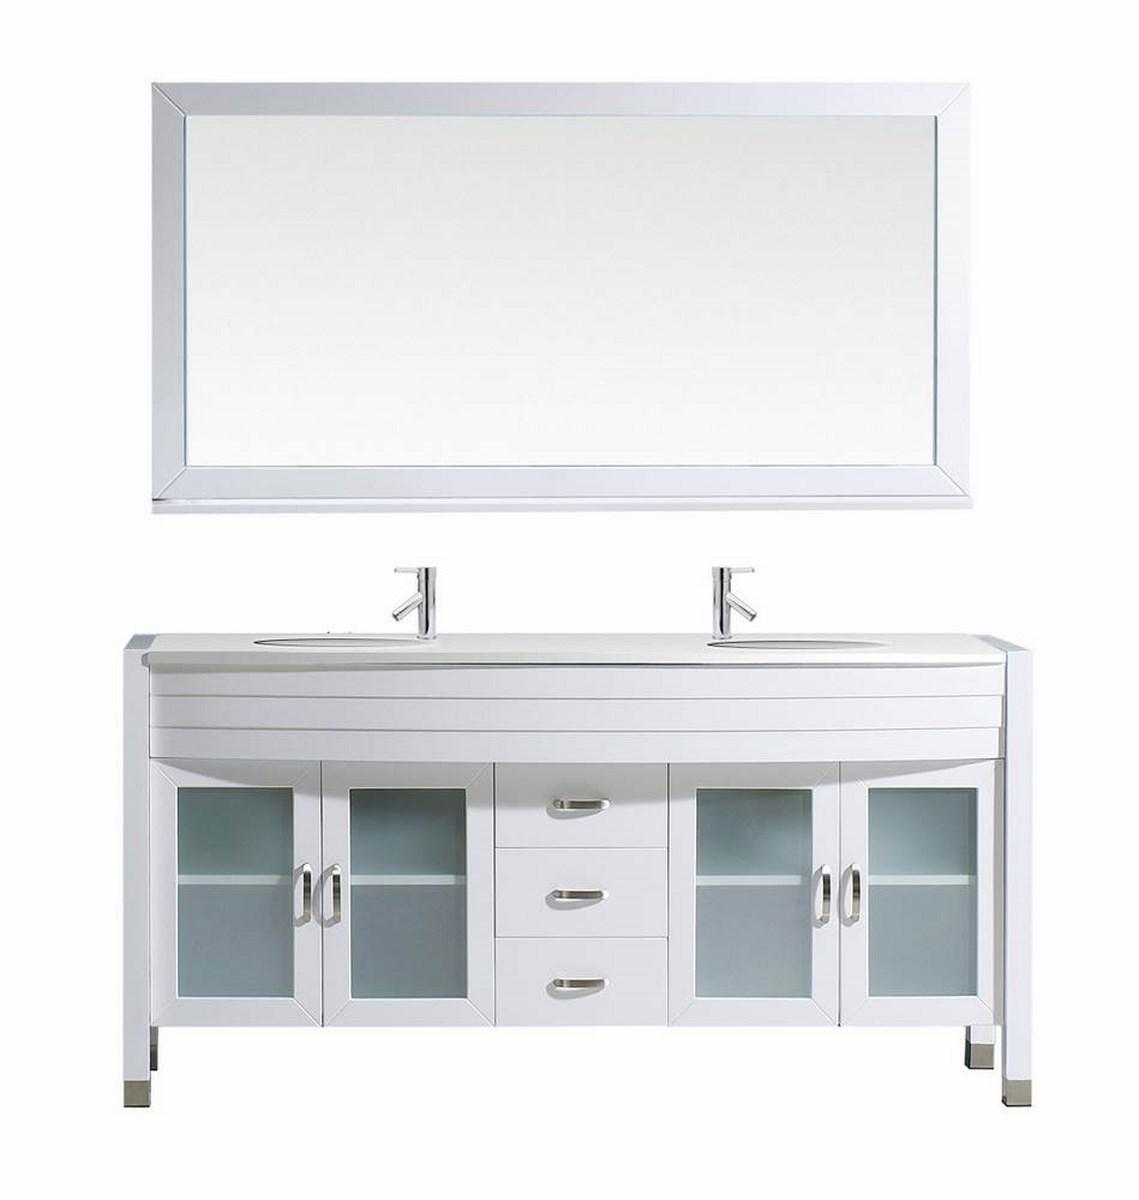 Virtu Usa Ava 63 Inch Double Bathroom Vanity Cabinet Set In White Efurniture Mart Home Decor